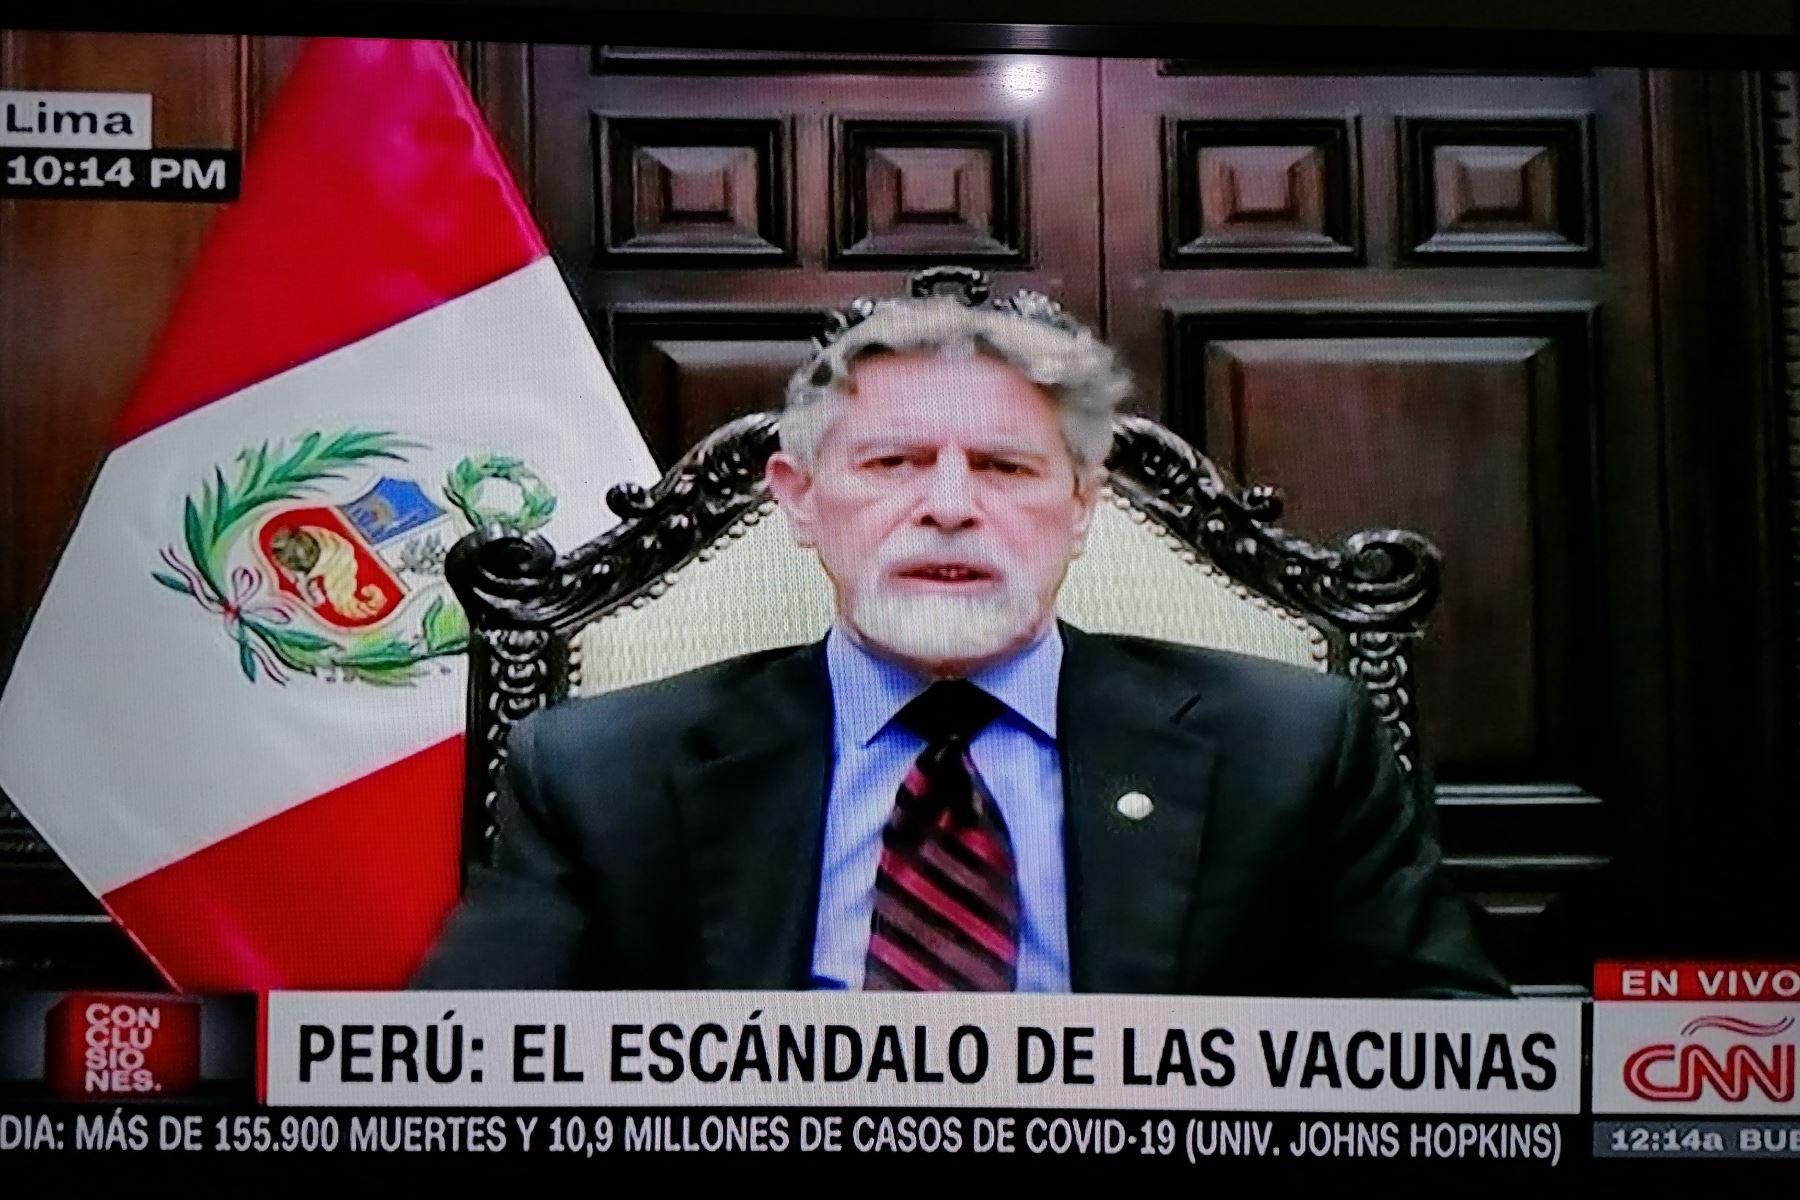 presidente-sagasti-no-paramos-ni-un-segundo-para-garantizar-acceso-a-la-vacuna